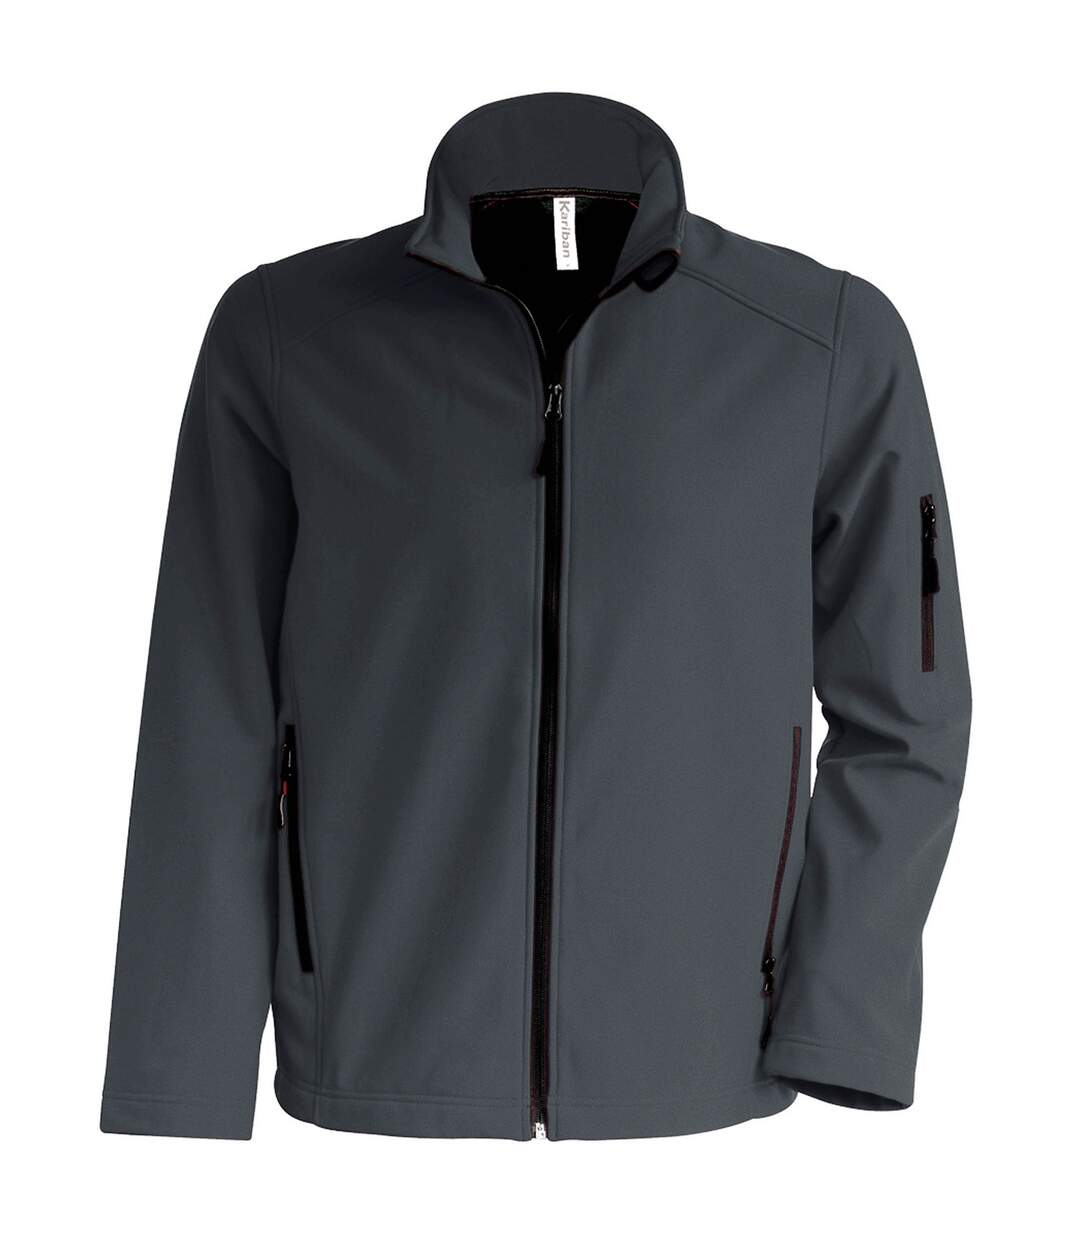 Kariban Mens Contemporary Softshell 3 Layer Performance Jacket (Titanium) - UTRW715